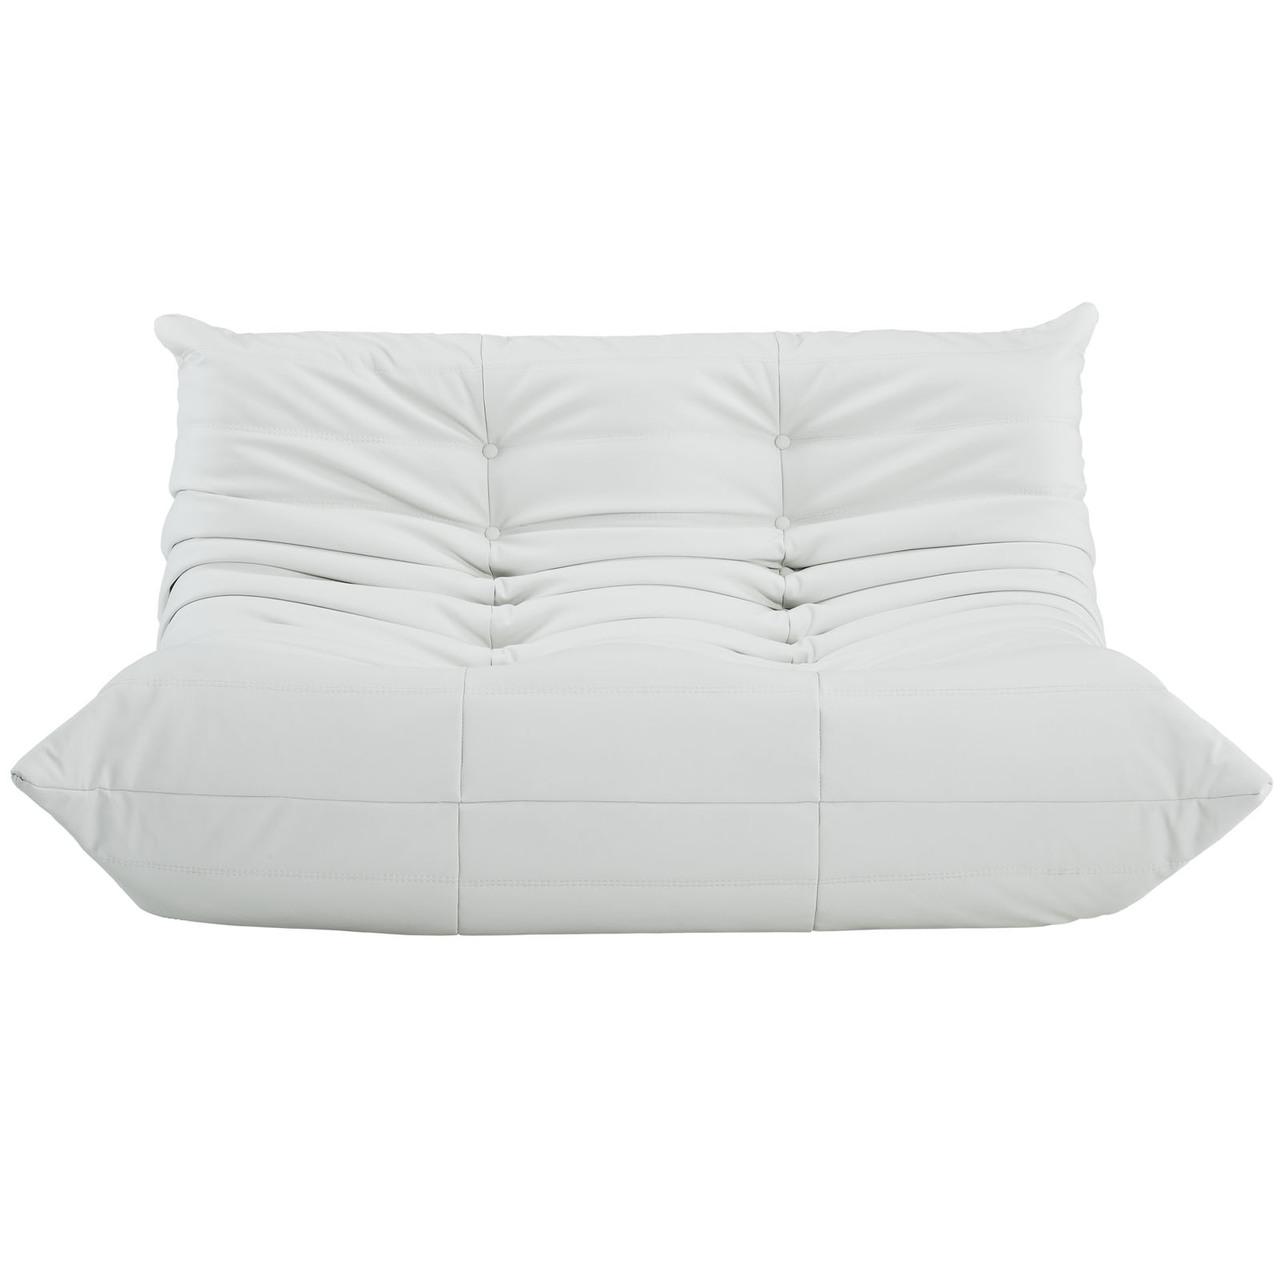 Downlow Loveseat White Leather Advanced Interior Designs